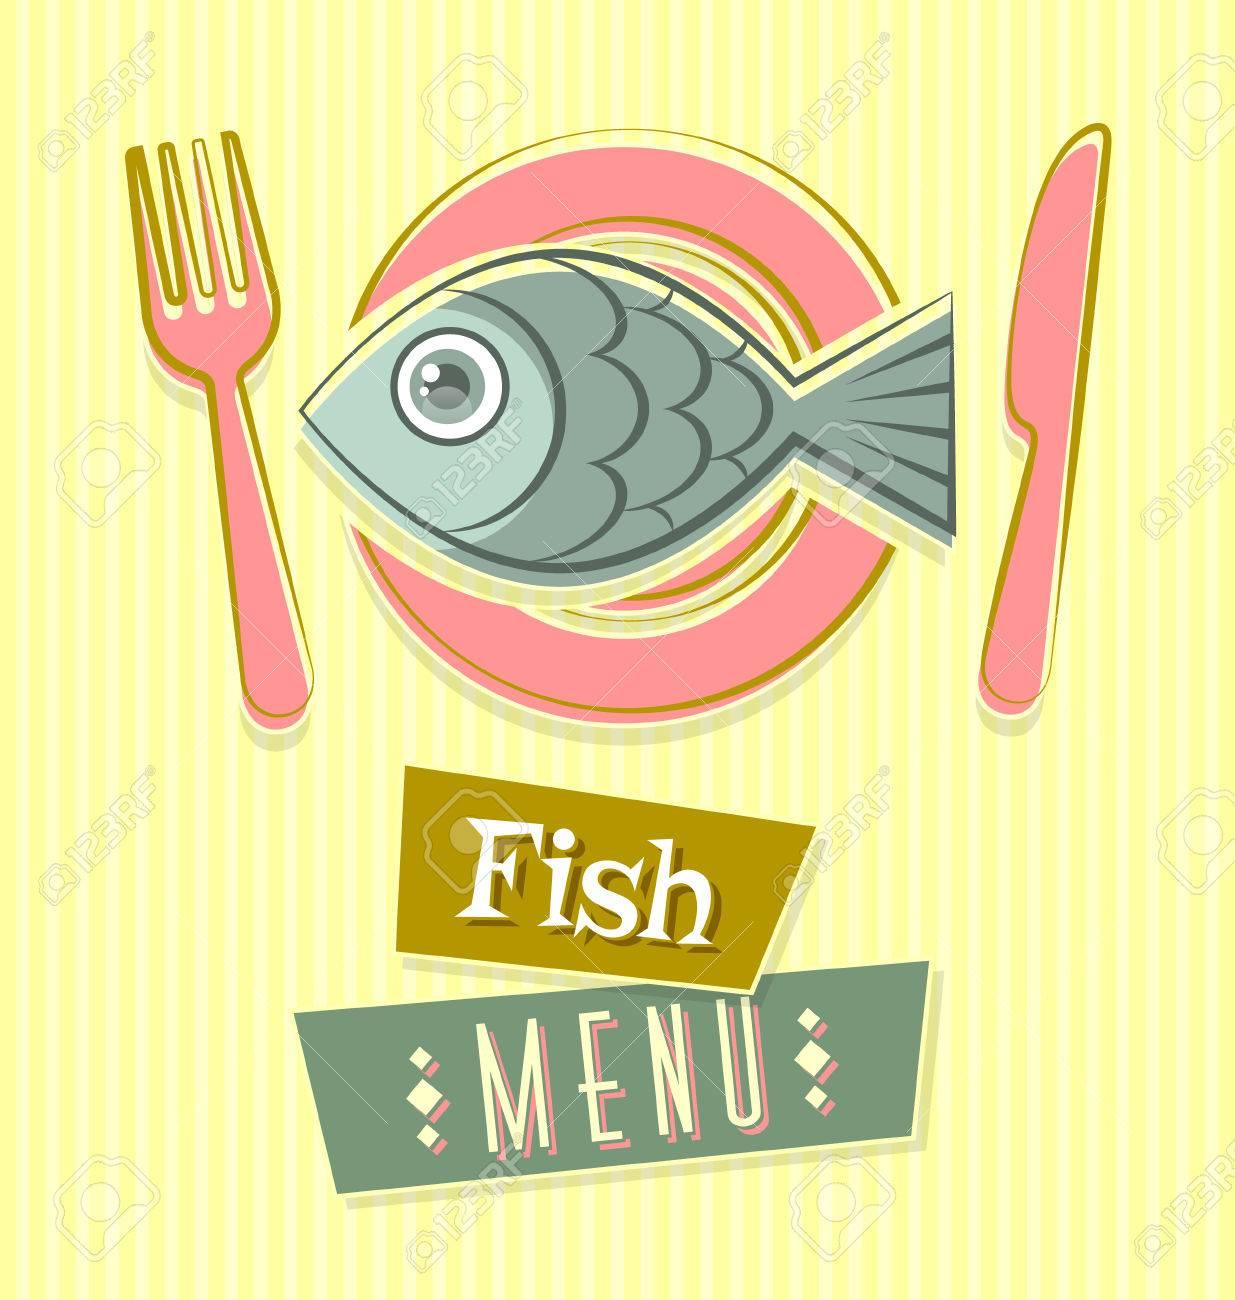 fish restaurant menu cover document template in retro style fish restaurant menu cover document template in retro style stock vector 29862877